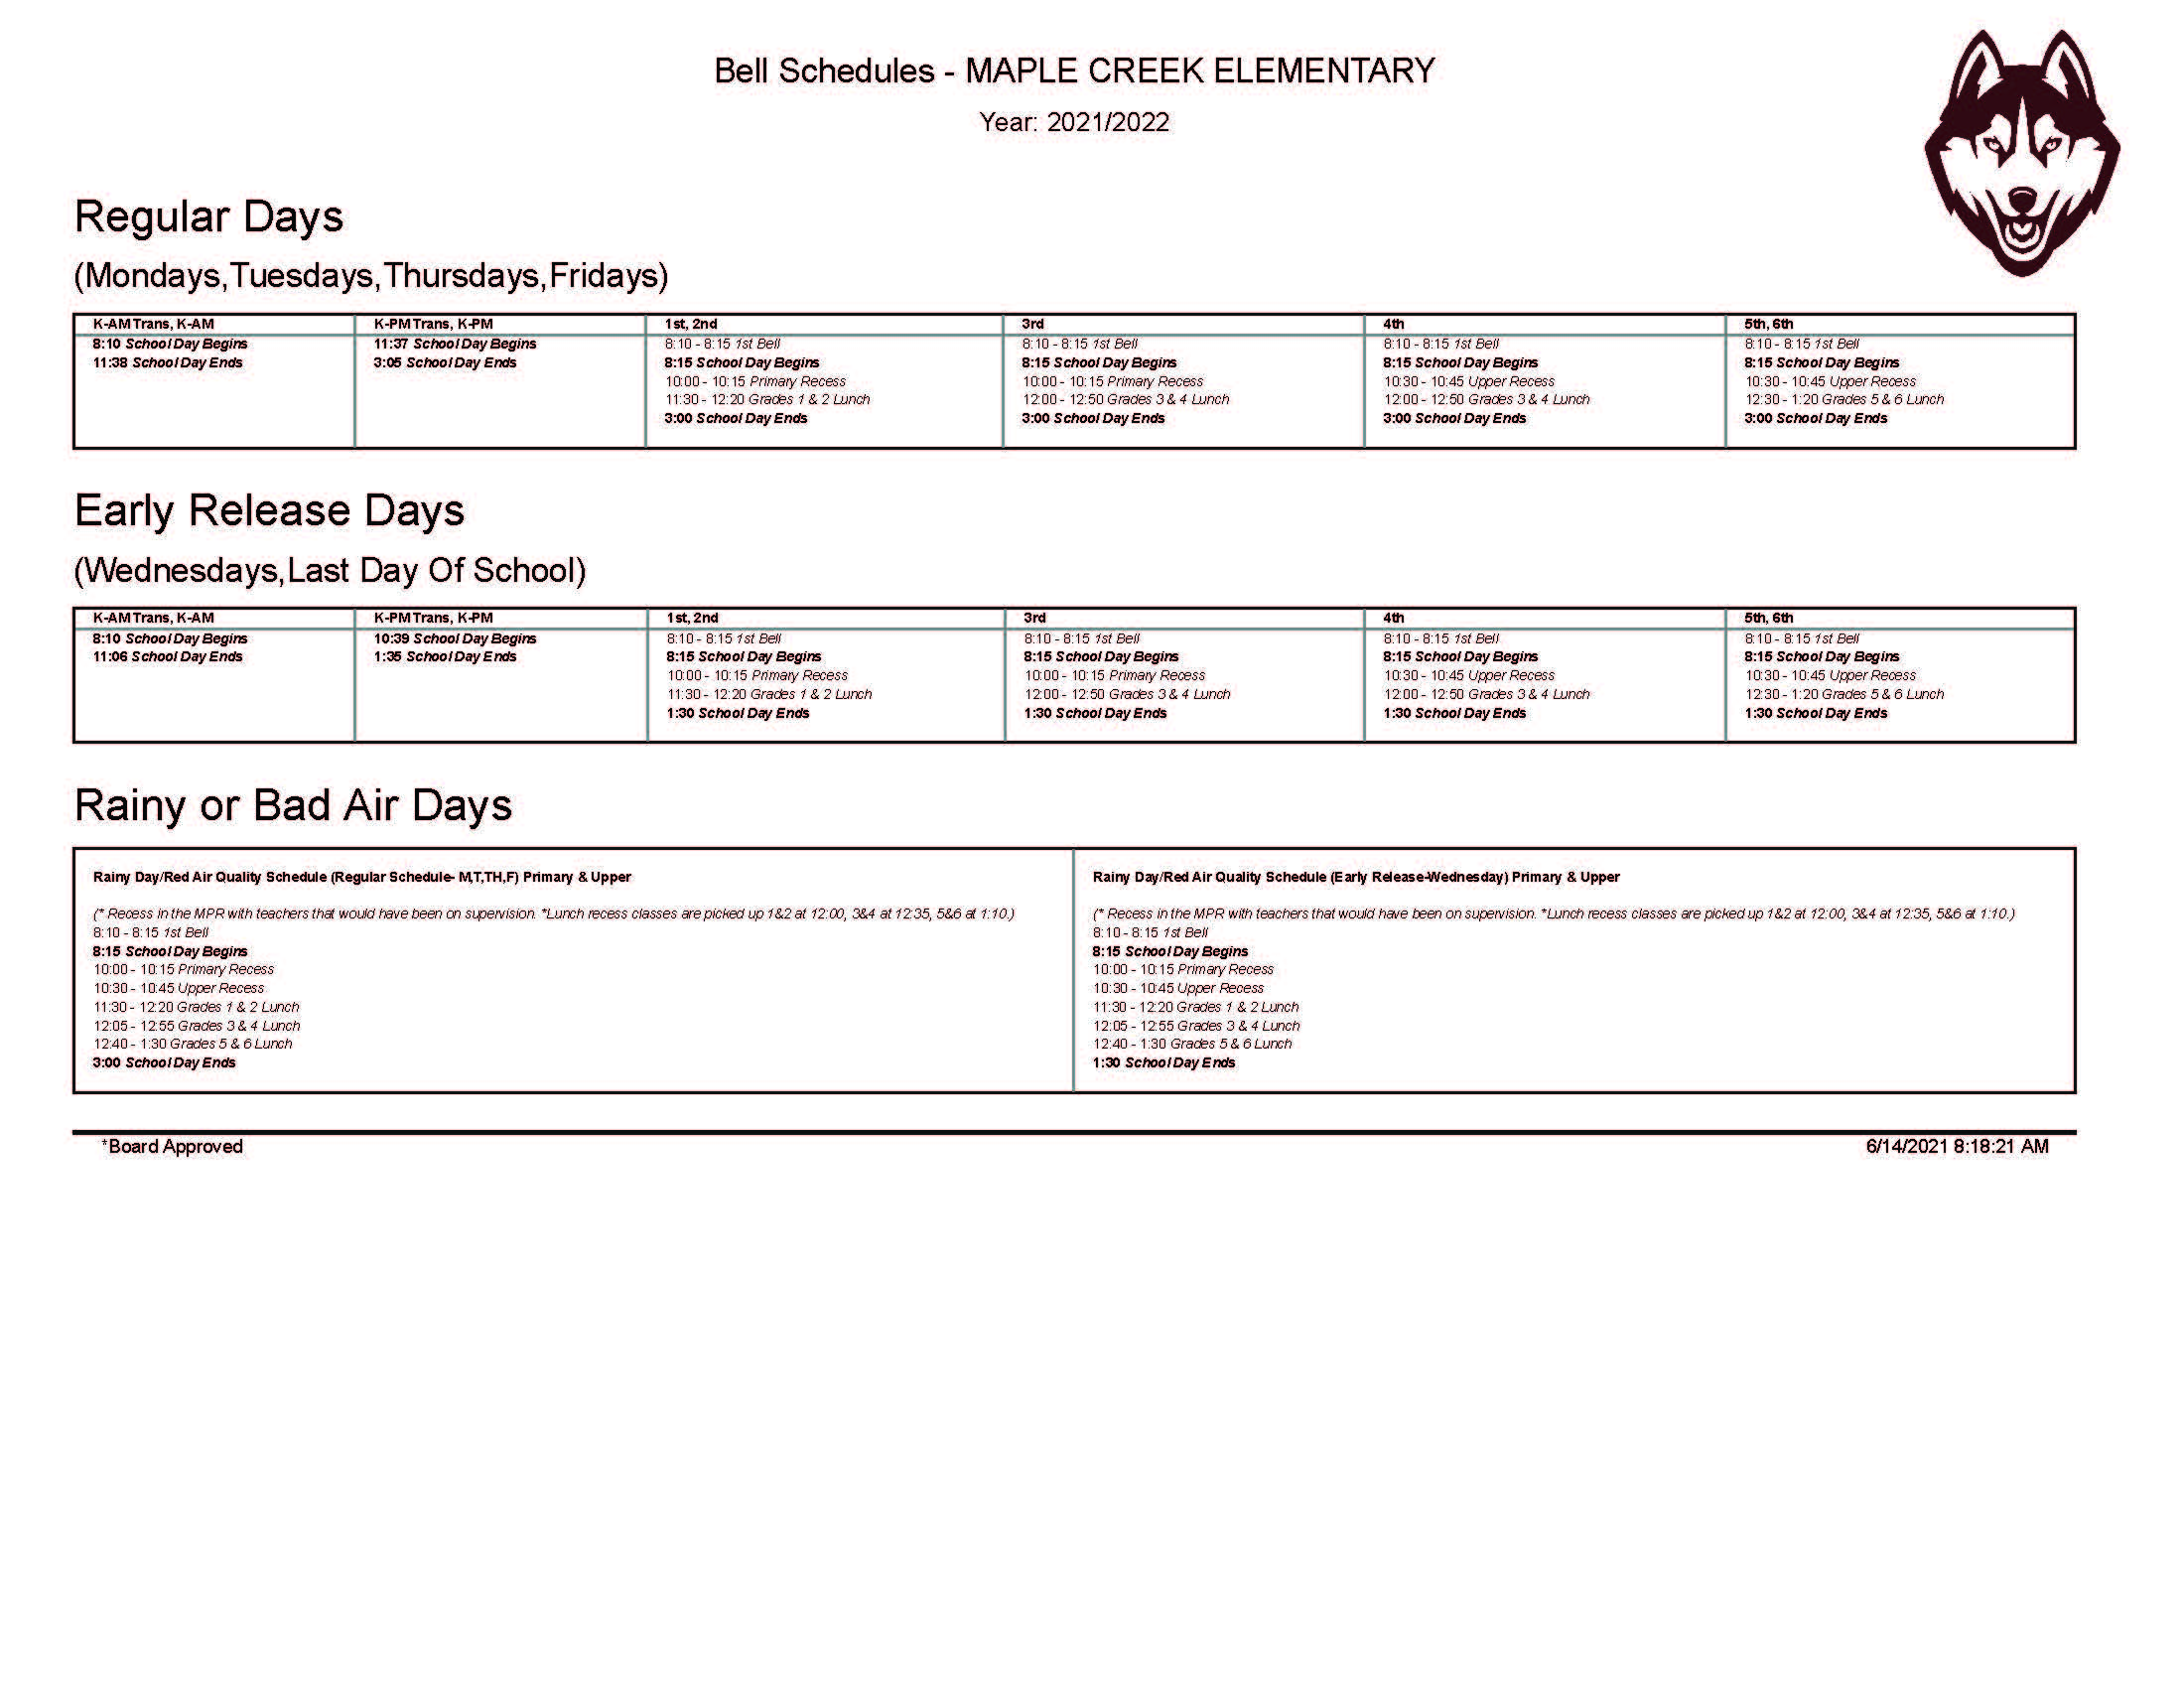 2021-22 Bell Schedule